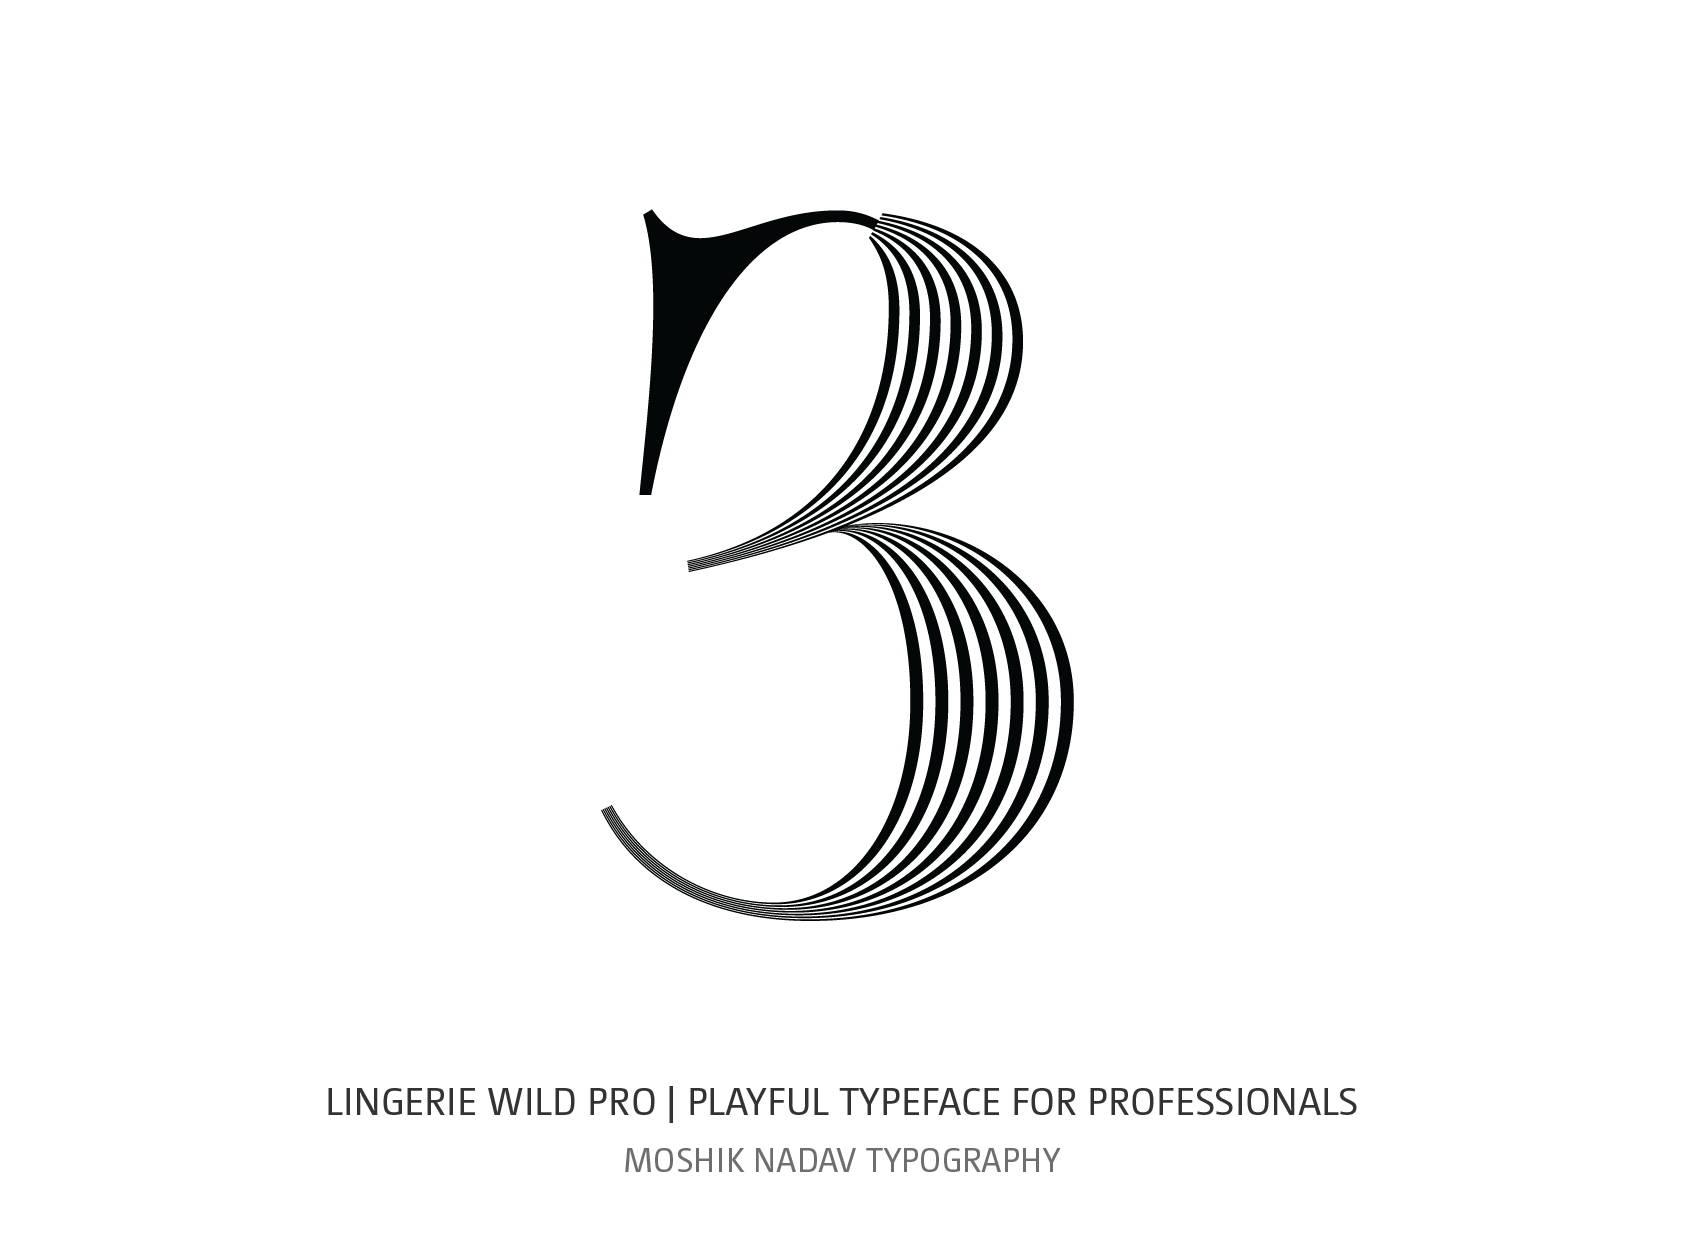 Lingerie Wild Pro Typeface visage style designed by Moshik Nadav Typography